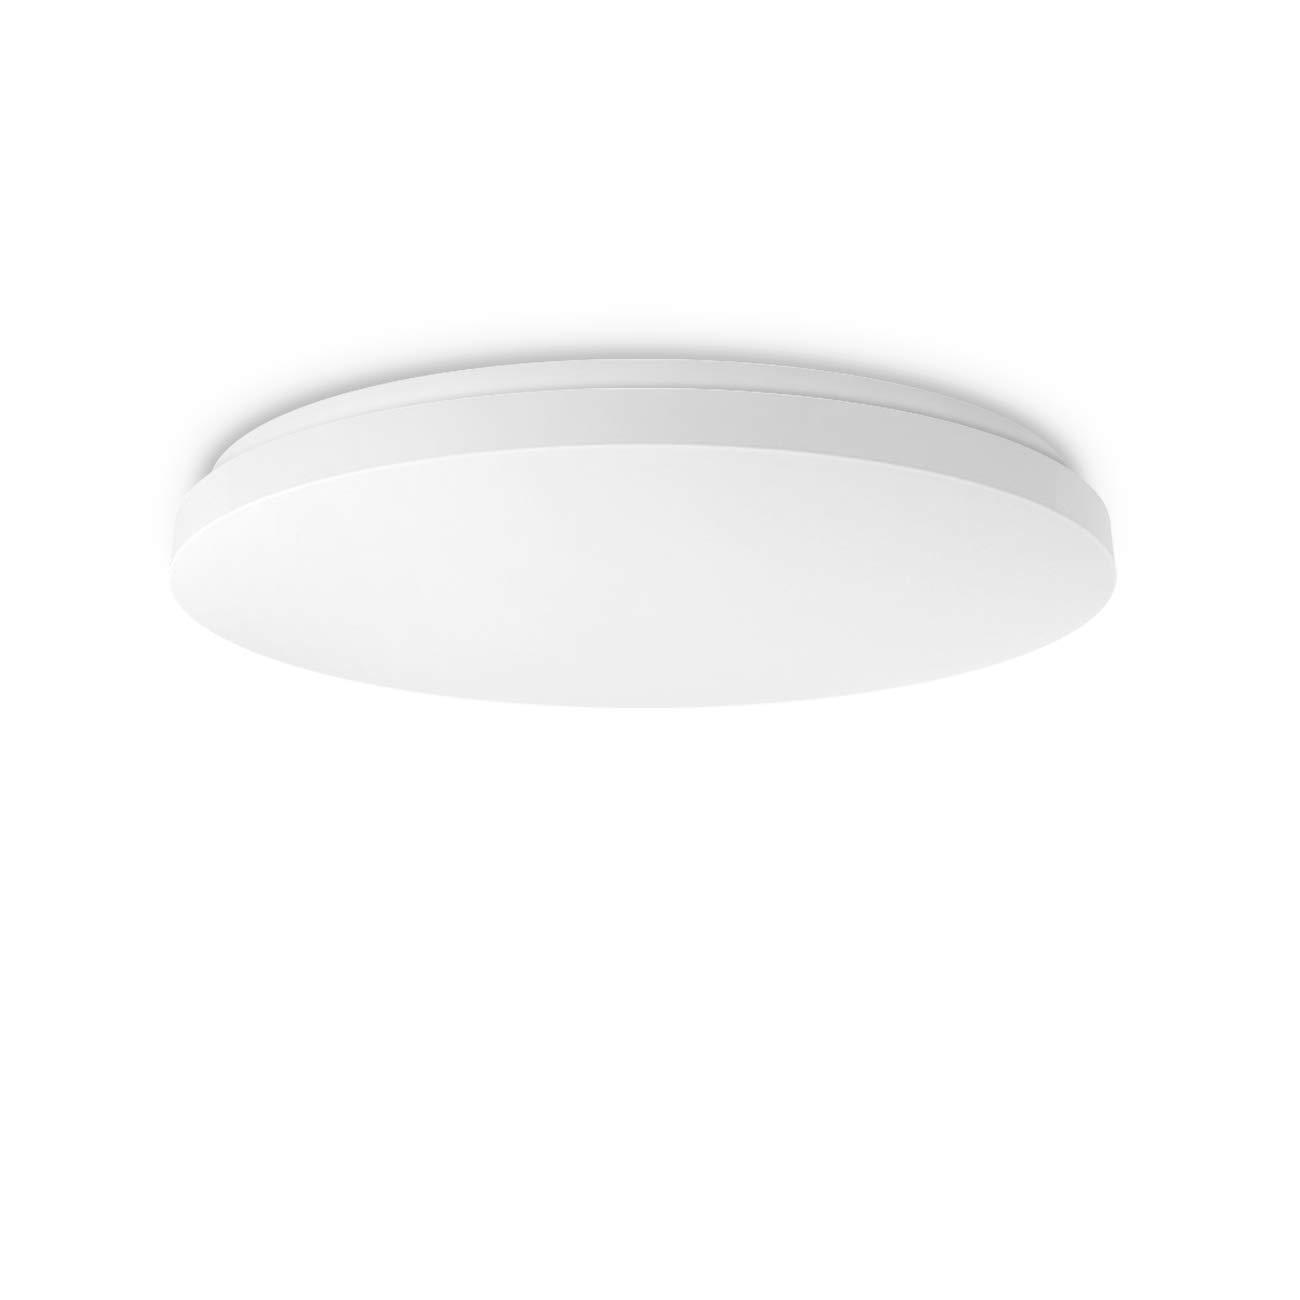 Plafoniera LED 18W Moderna, Lampada da Soffitto per bagno, cucina, cameretta LVWIT AC010E-18W-Nw